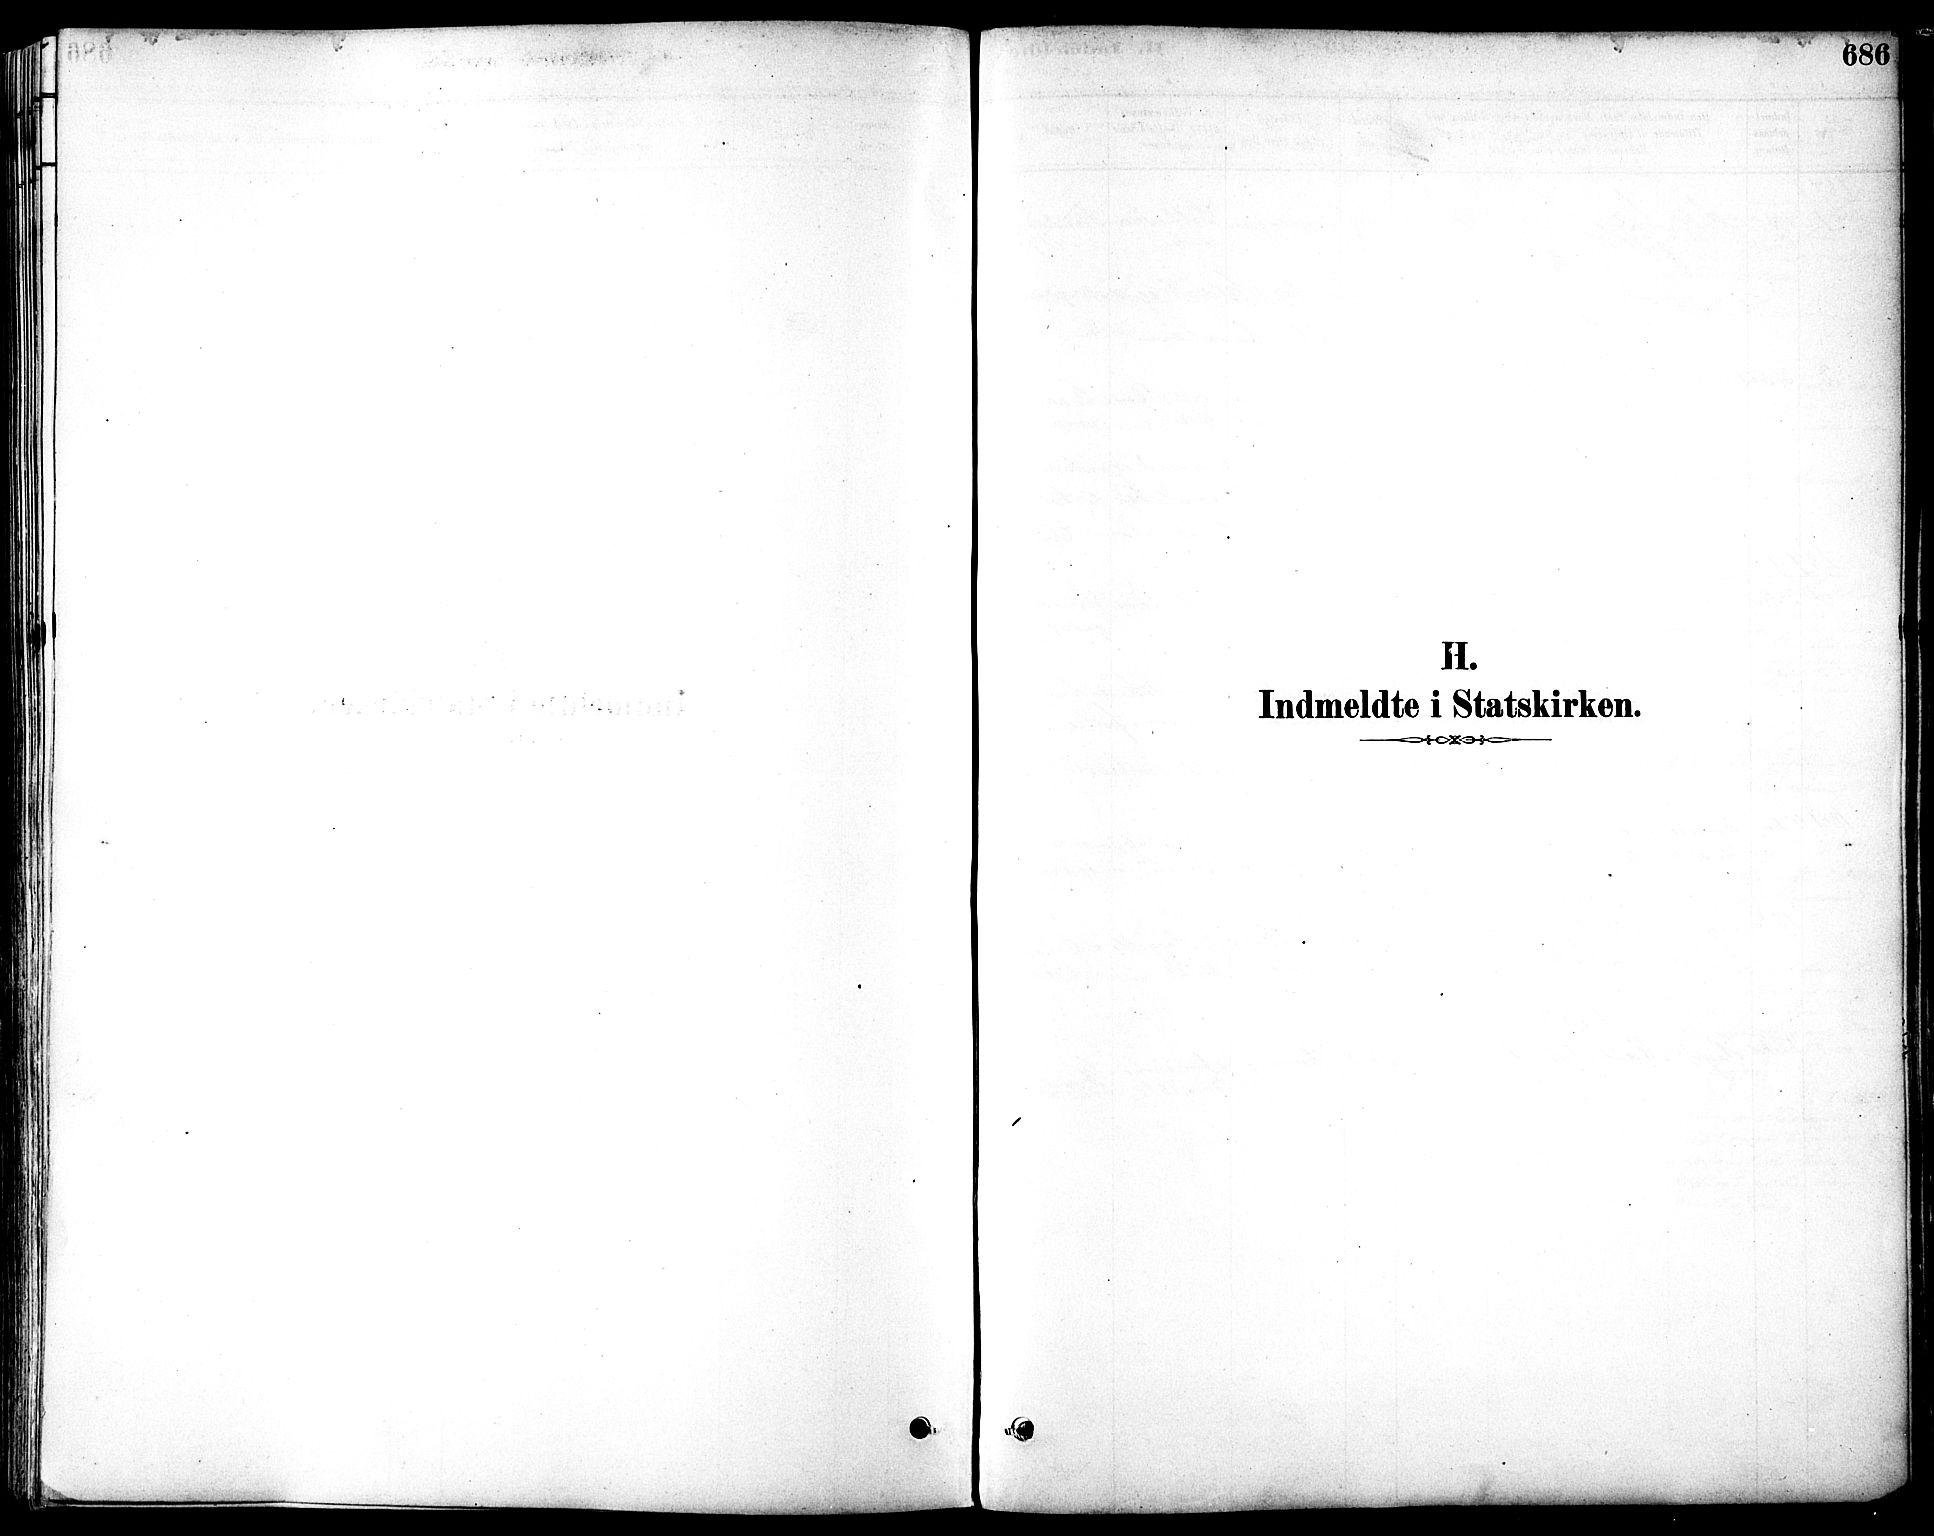 SAT, Ministerialprotokoller, klokkerbøker og fødselsregistre - Sør-Trøndelag, 601/L0058: Parish register (official) no. 601A26, 1877-1891, p. 686